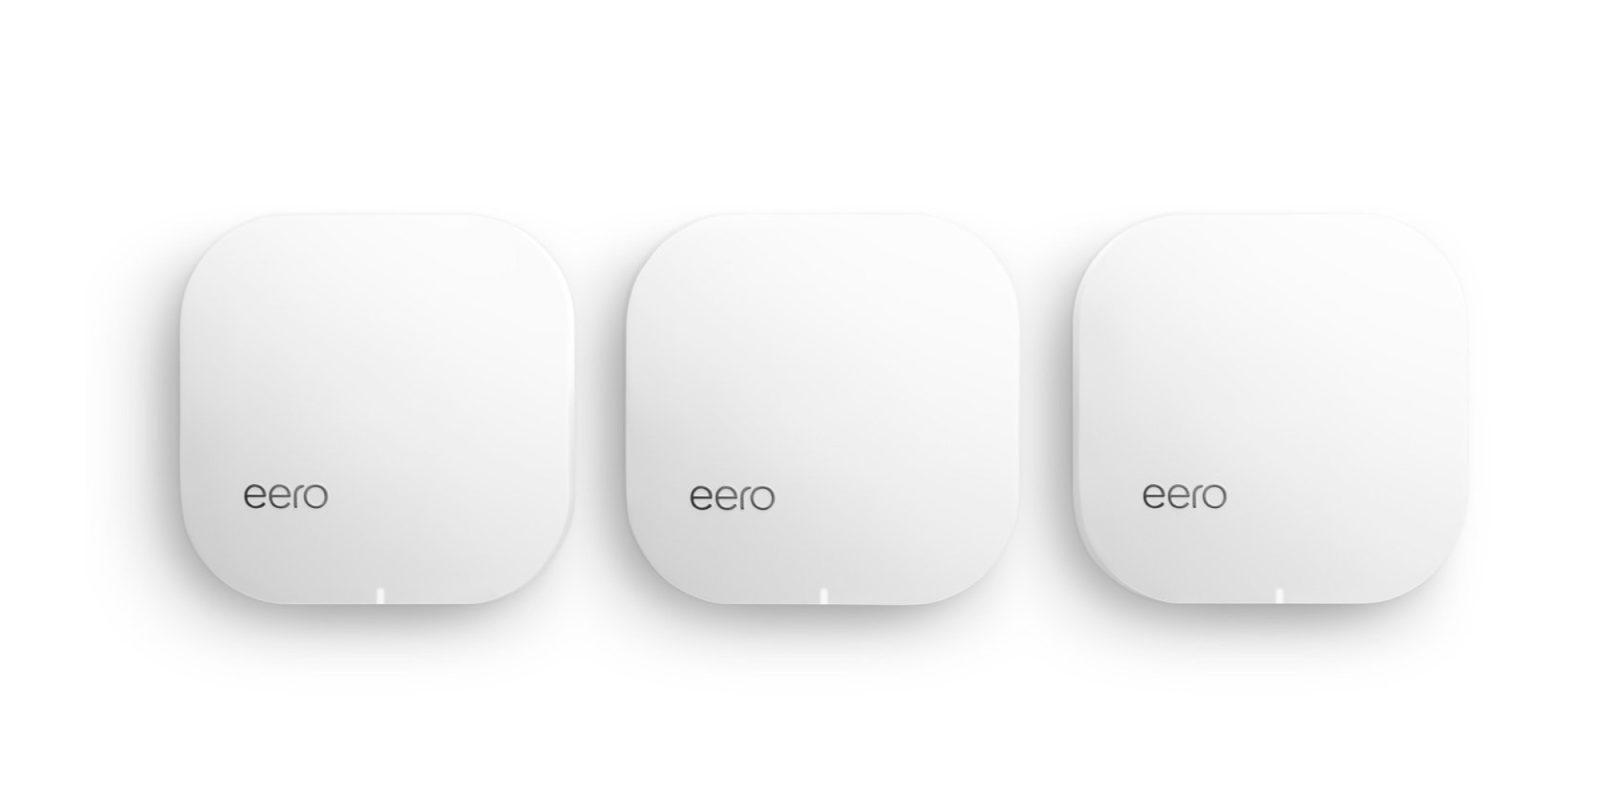 Amazon slashes 20% off its eero Pro 802.11ac mesh Wi-Fi kits starting at $239